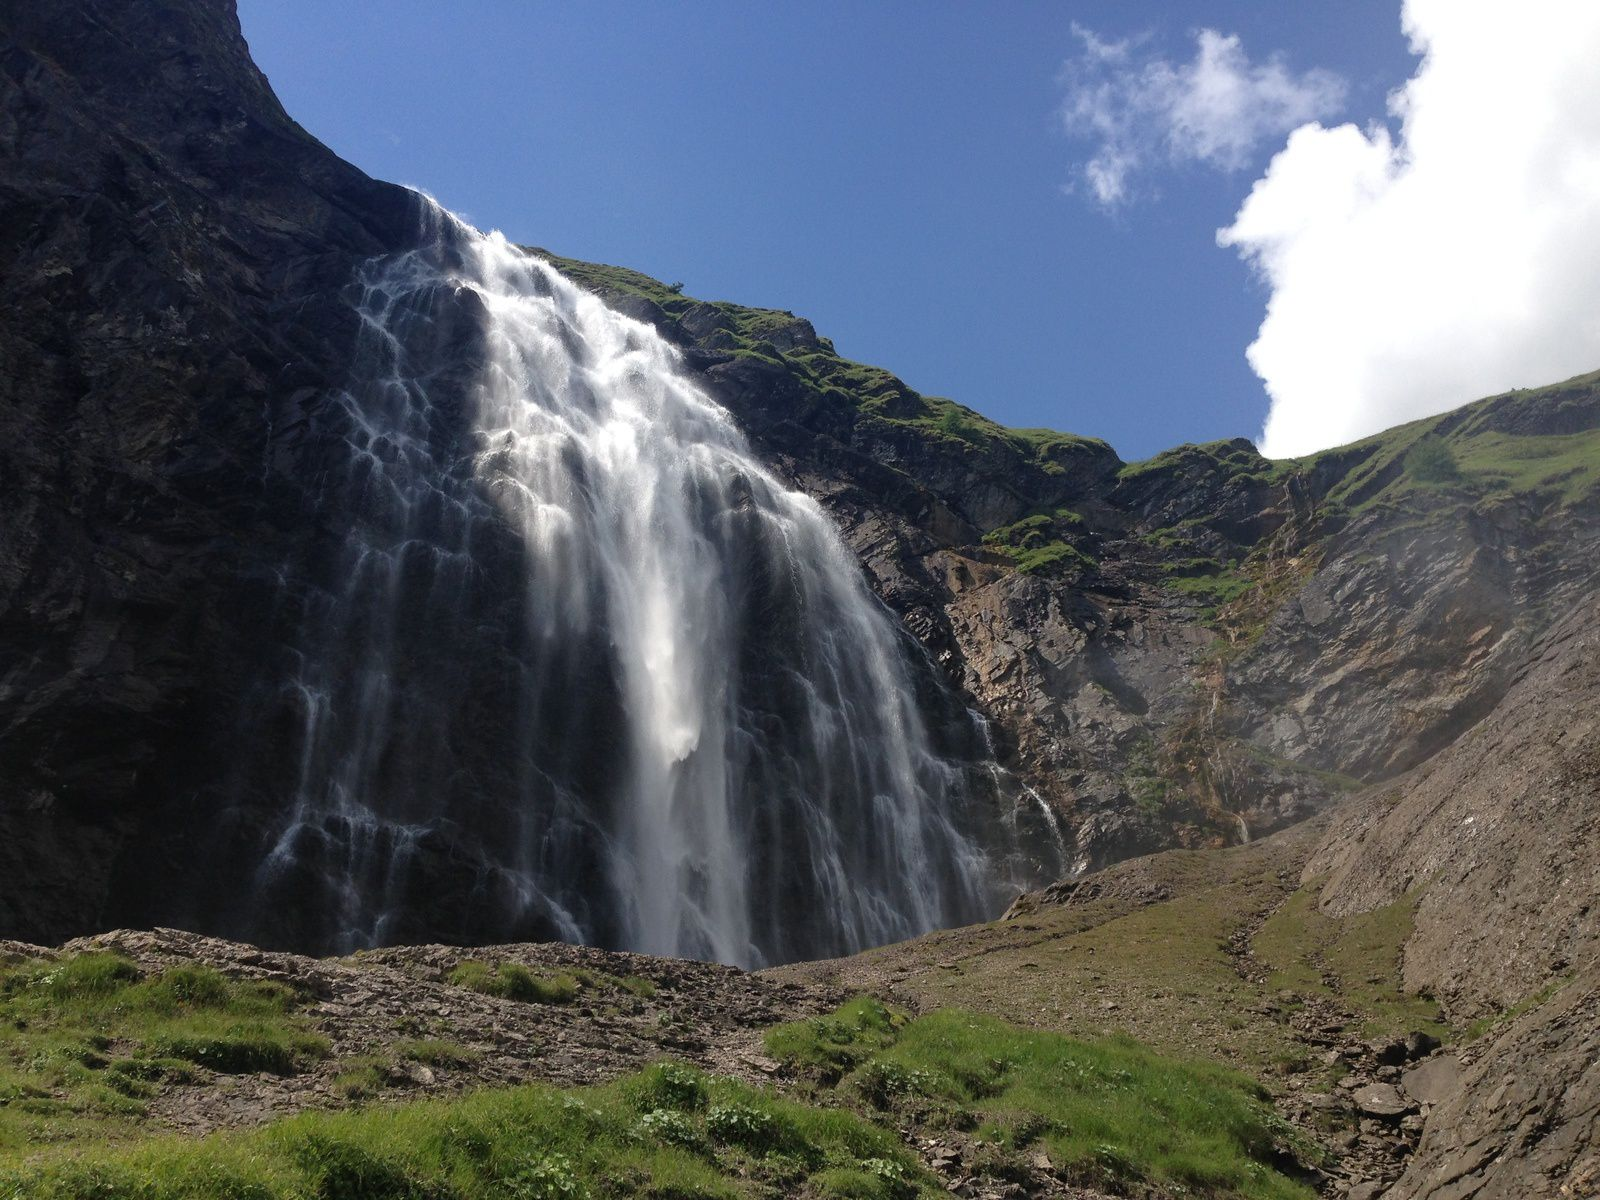 mardi  18 juillet: Cascade de l'Engstligen à Adelboden